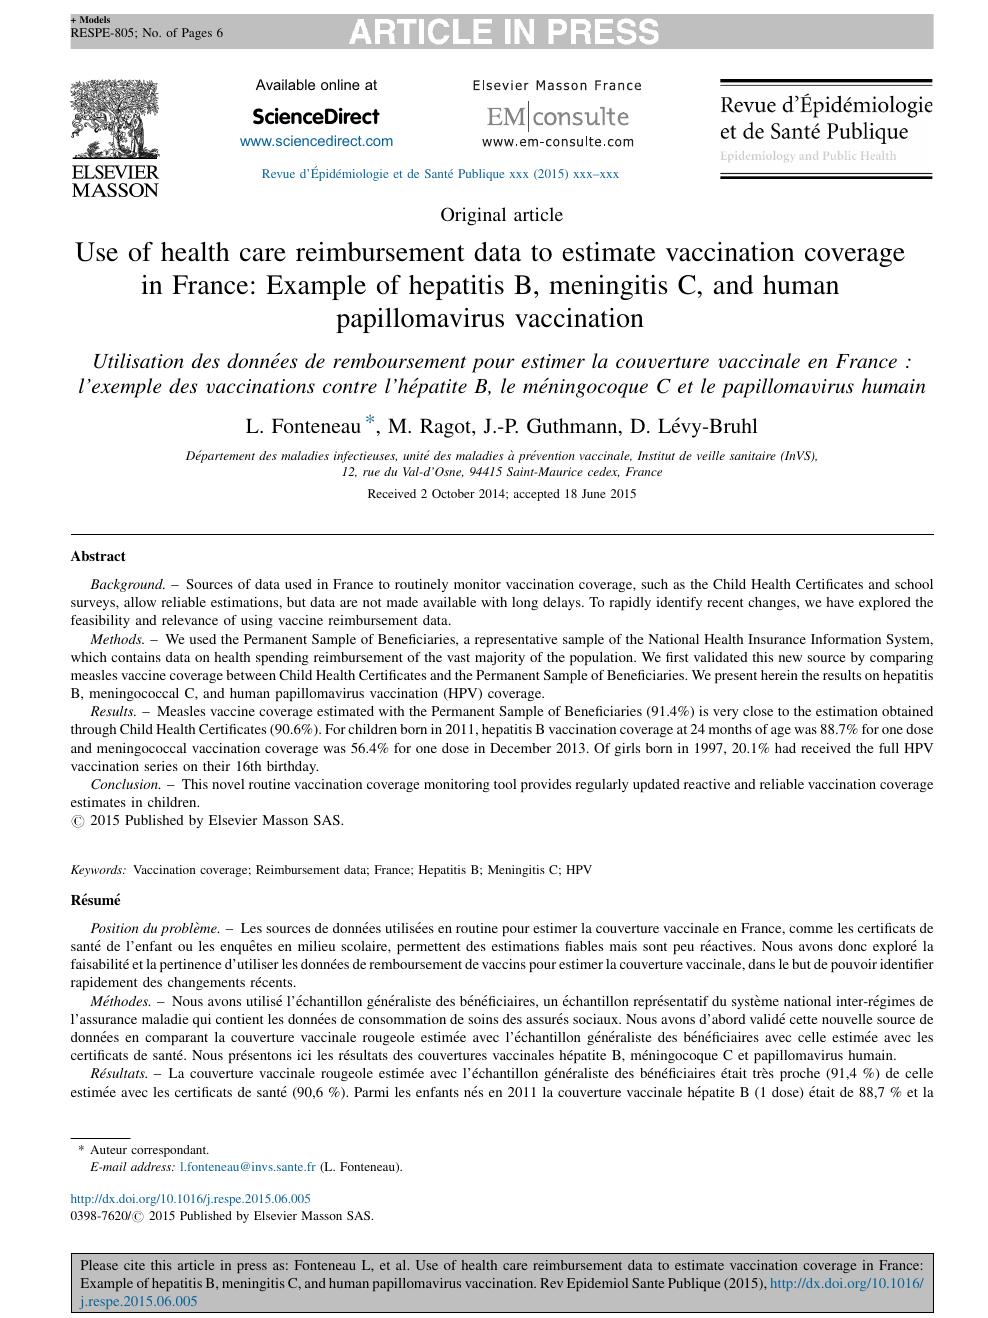 human papillomavirus in french)